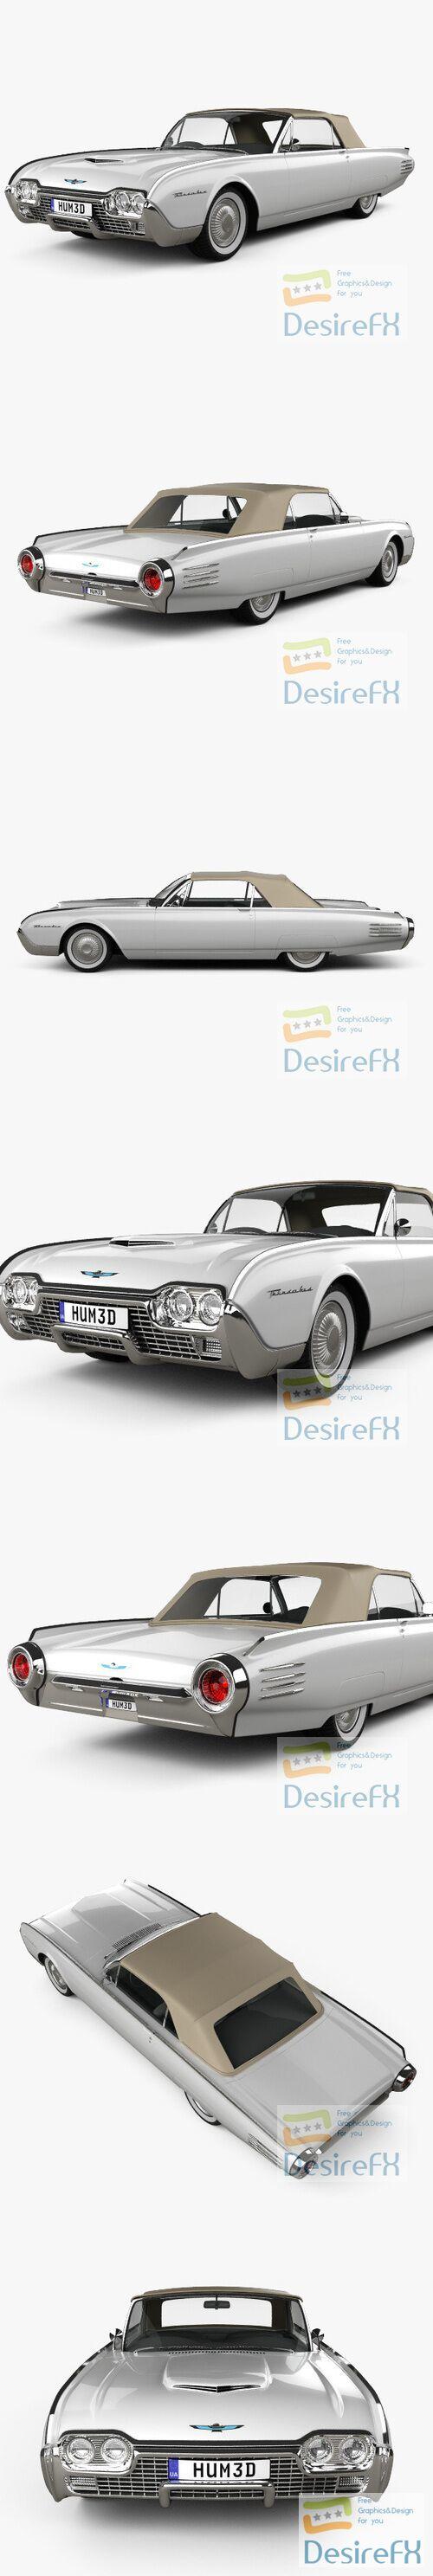 Ford Thunderbird 1961 3D Model